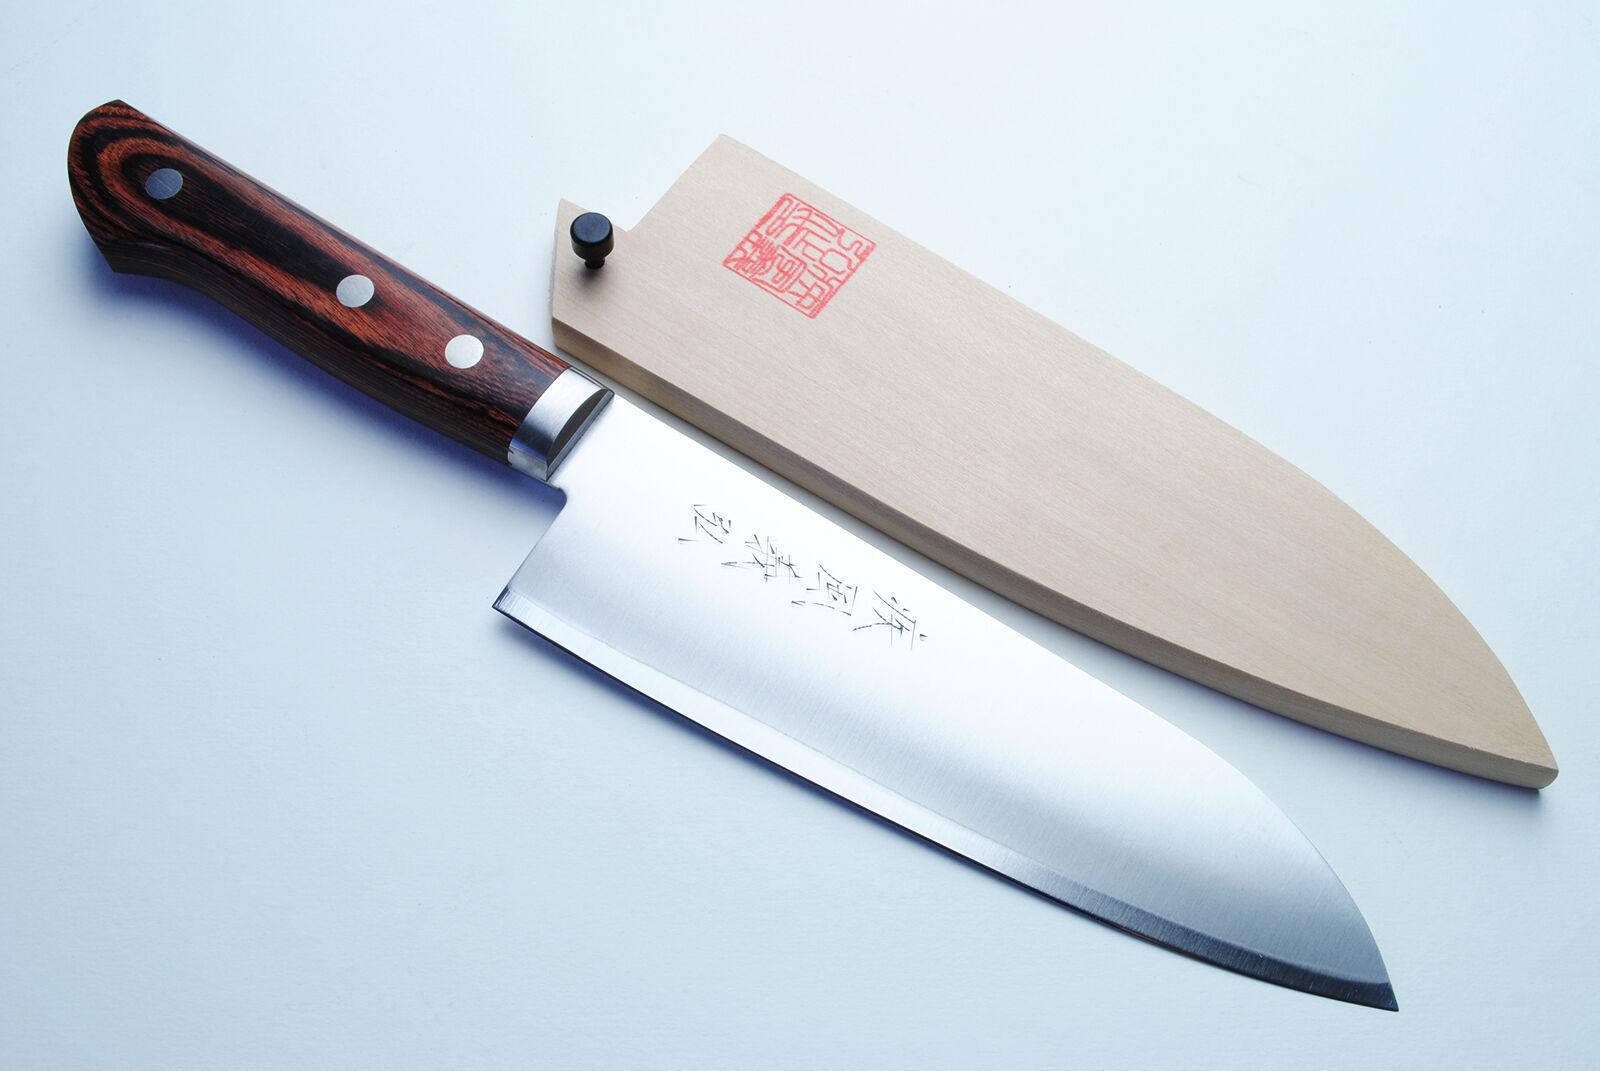 Gold Steel Santoku 16.5cm Japanese sushi chefs knife YOSHIHIRO   eBay